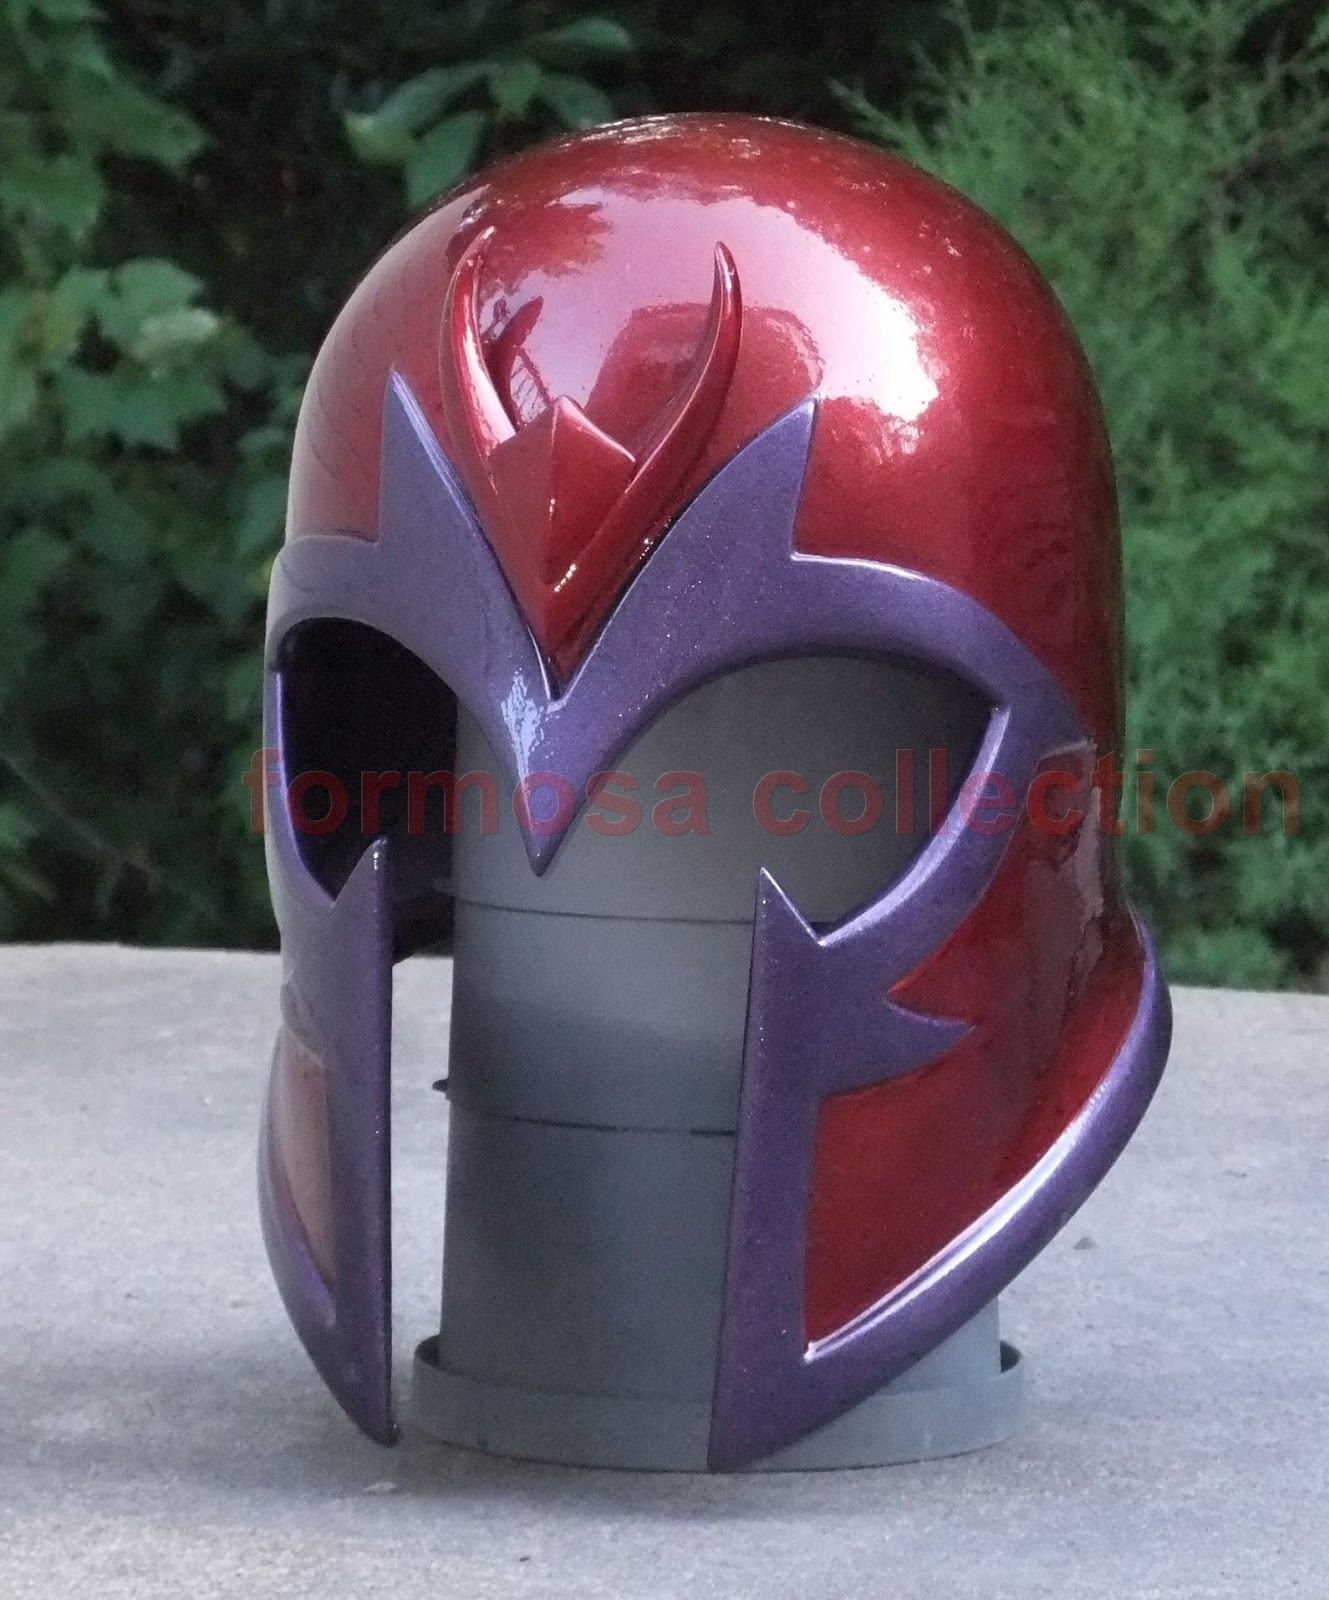 Formosa-Collection: X Men First Class Magneto Helmet build 3